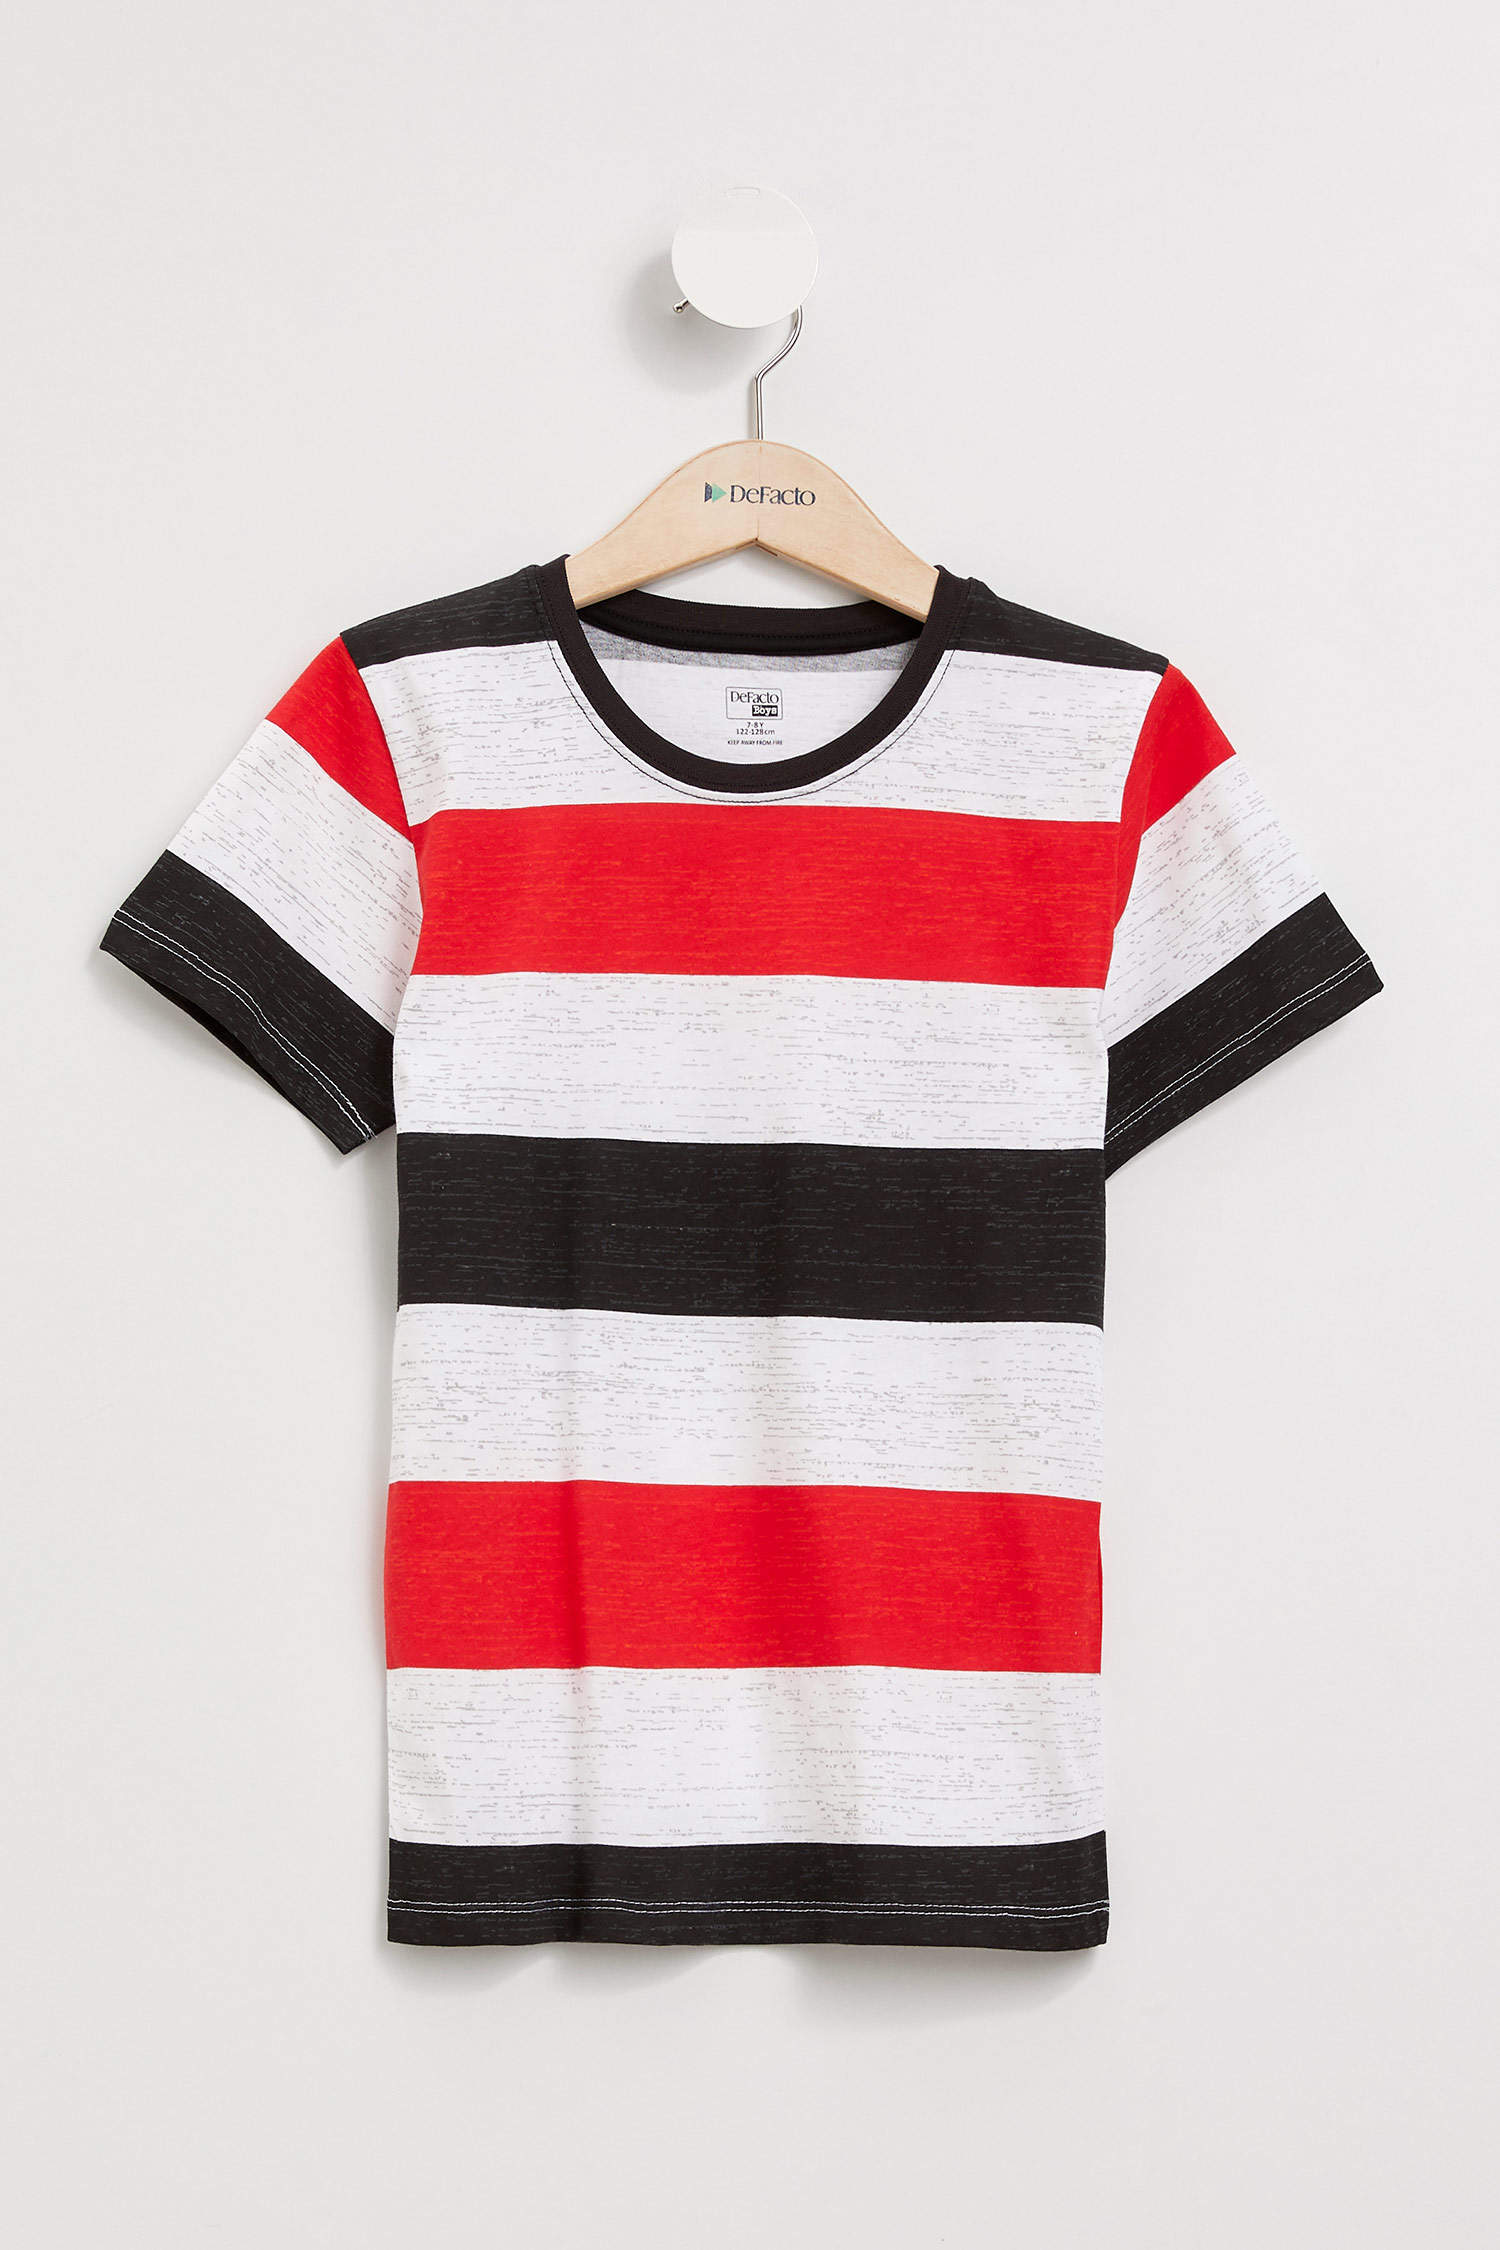 Kirmizi Erkek Cocuk Genc Erkek Erkek Cocuk Yatay Cizgili T Shirt